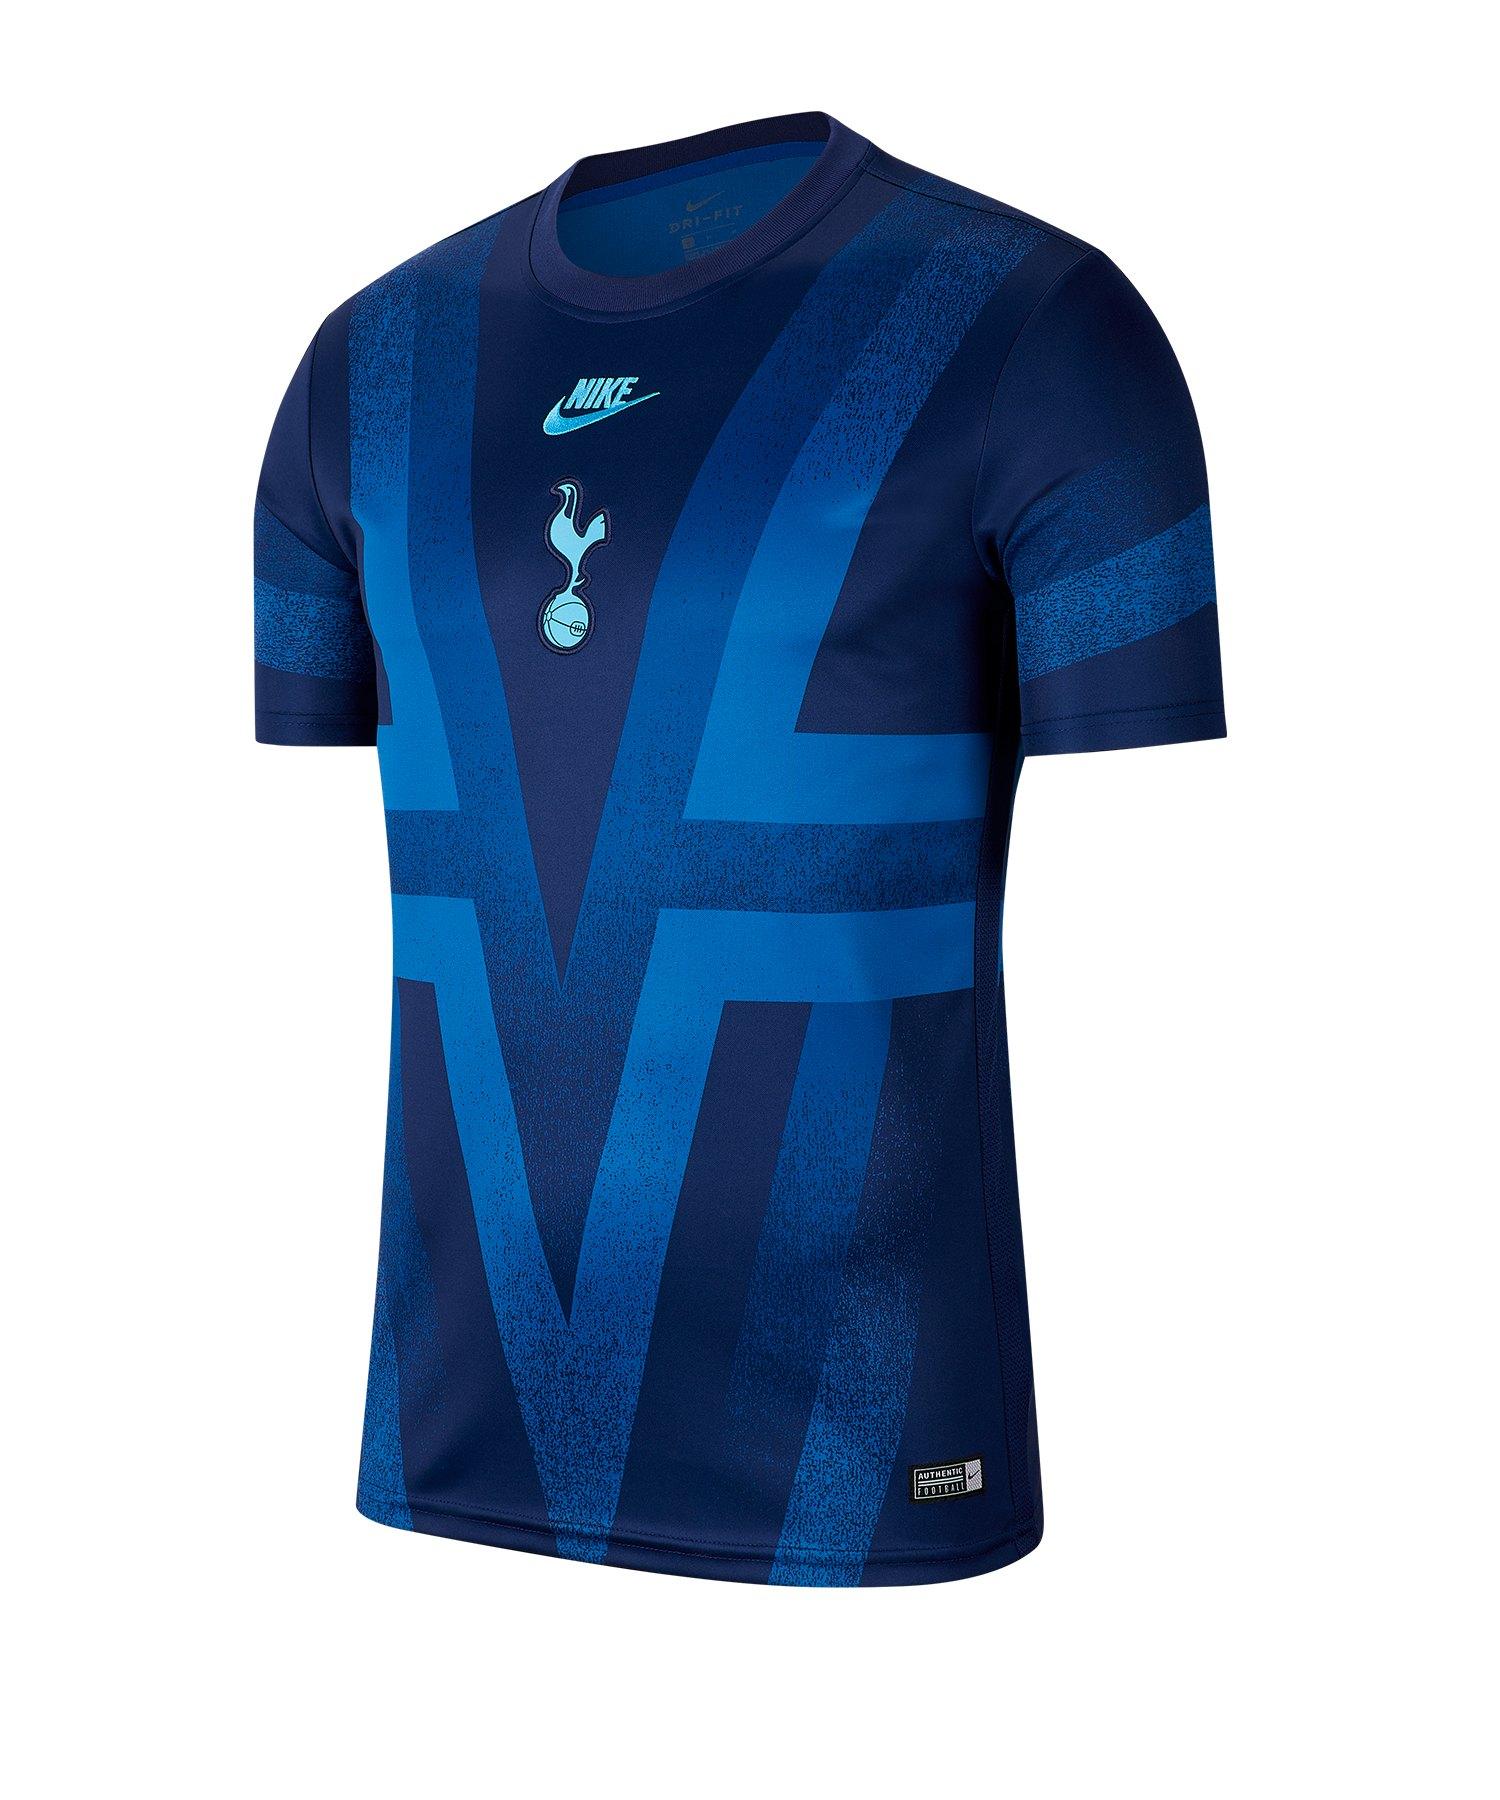 Nike Tottenham Hotspur Dri-Fit T-Shirt CL F433 - blau